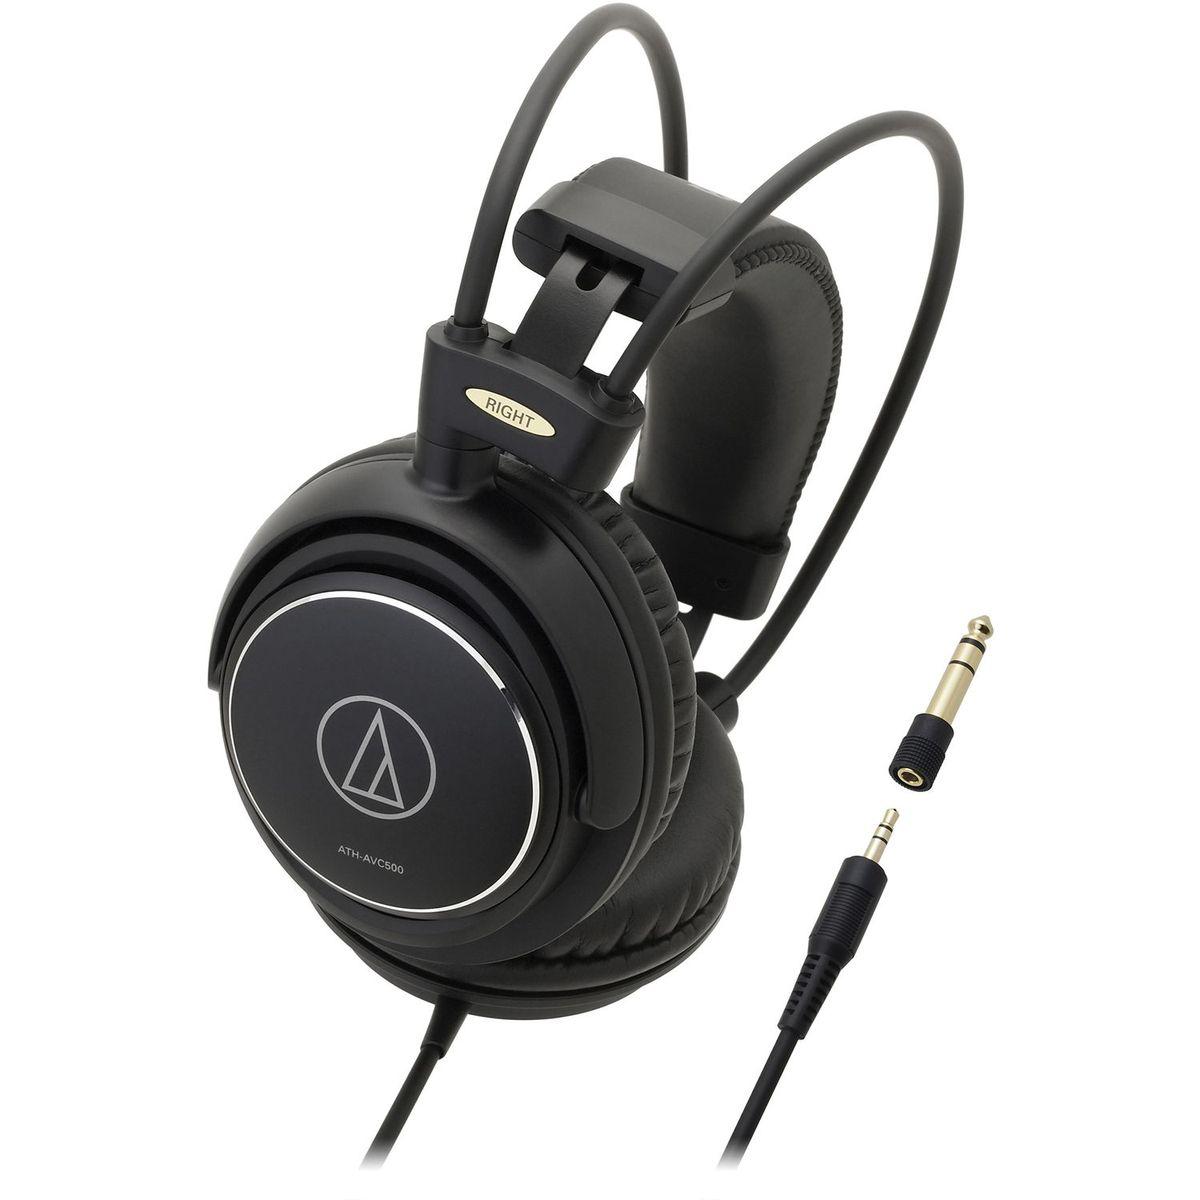 Casque audio ATH AVC 500 - Noir